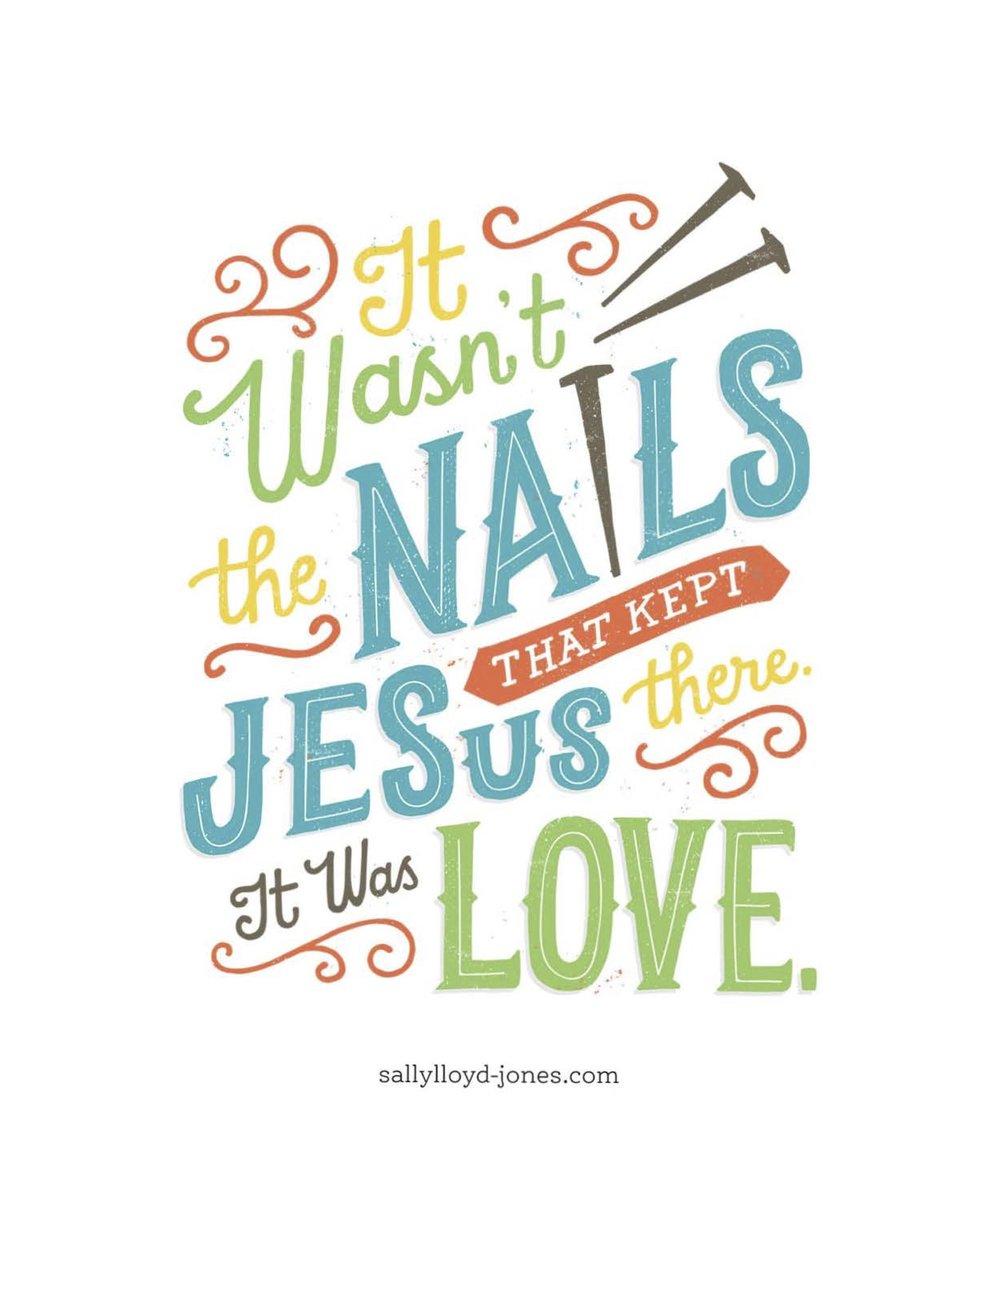 The_Jesus_Storybook_Bible_Lent_2019_Printable_Reading_Guide_by_Sally_Lloyd_Jones4.jpg